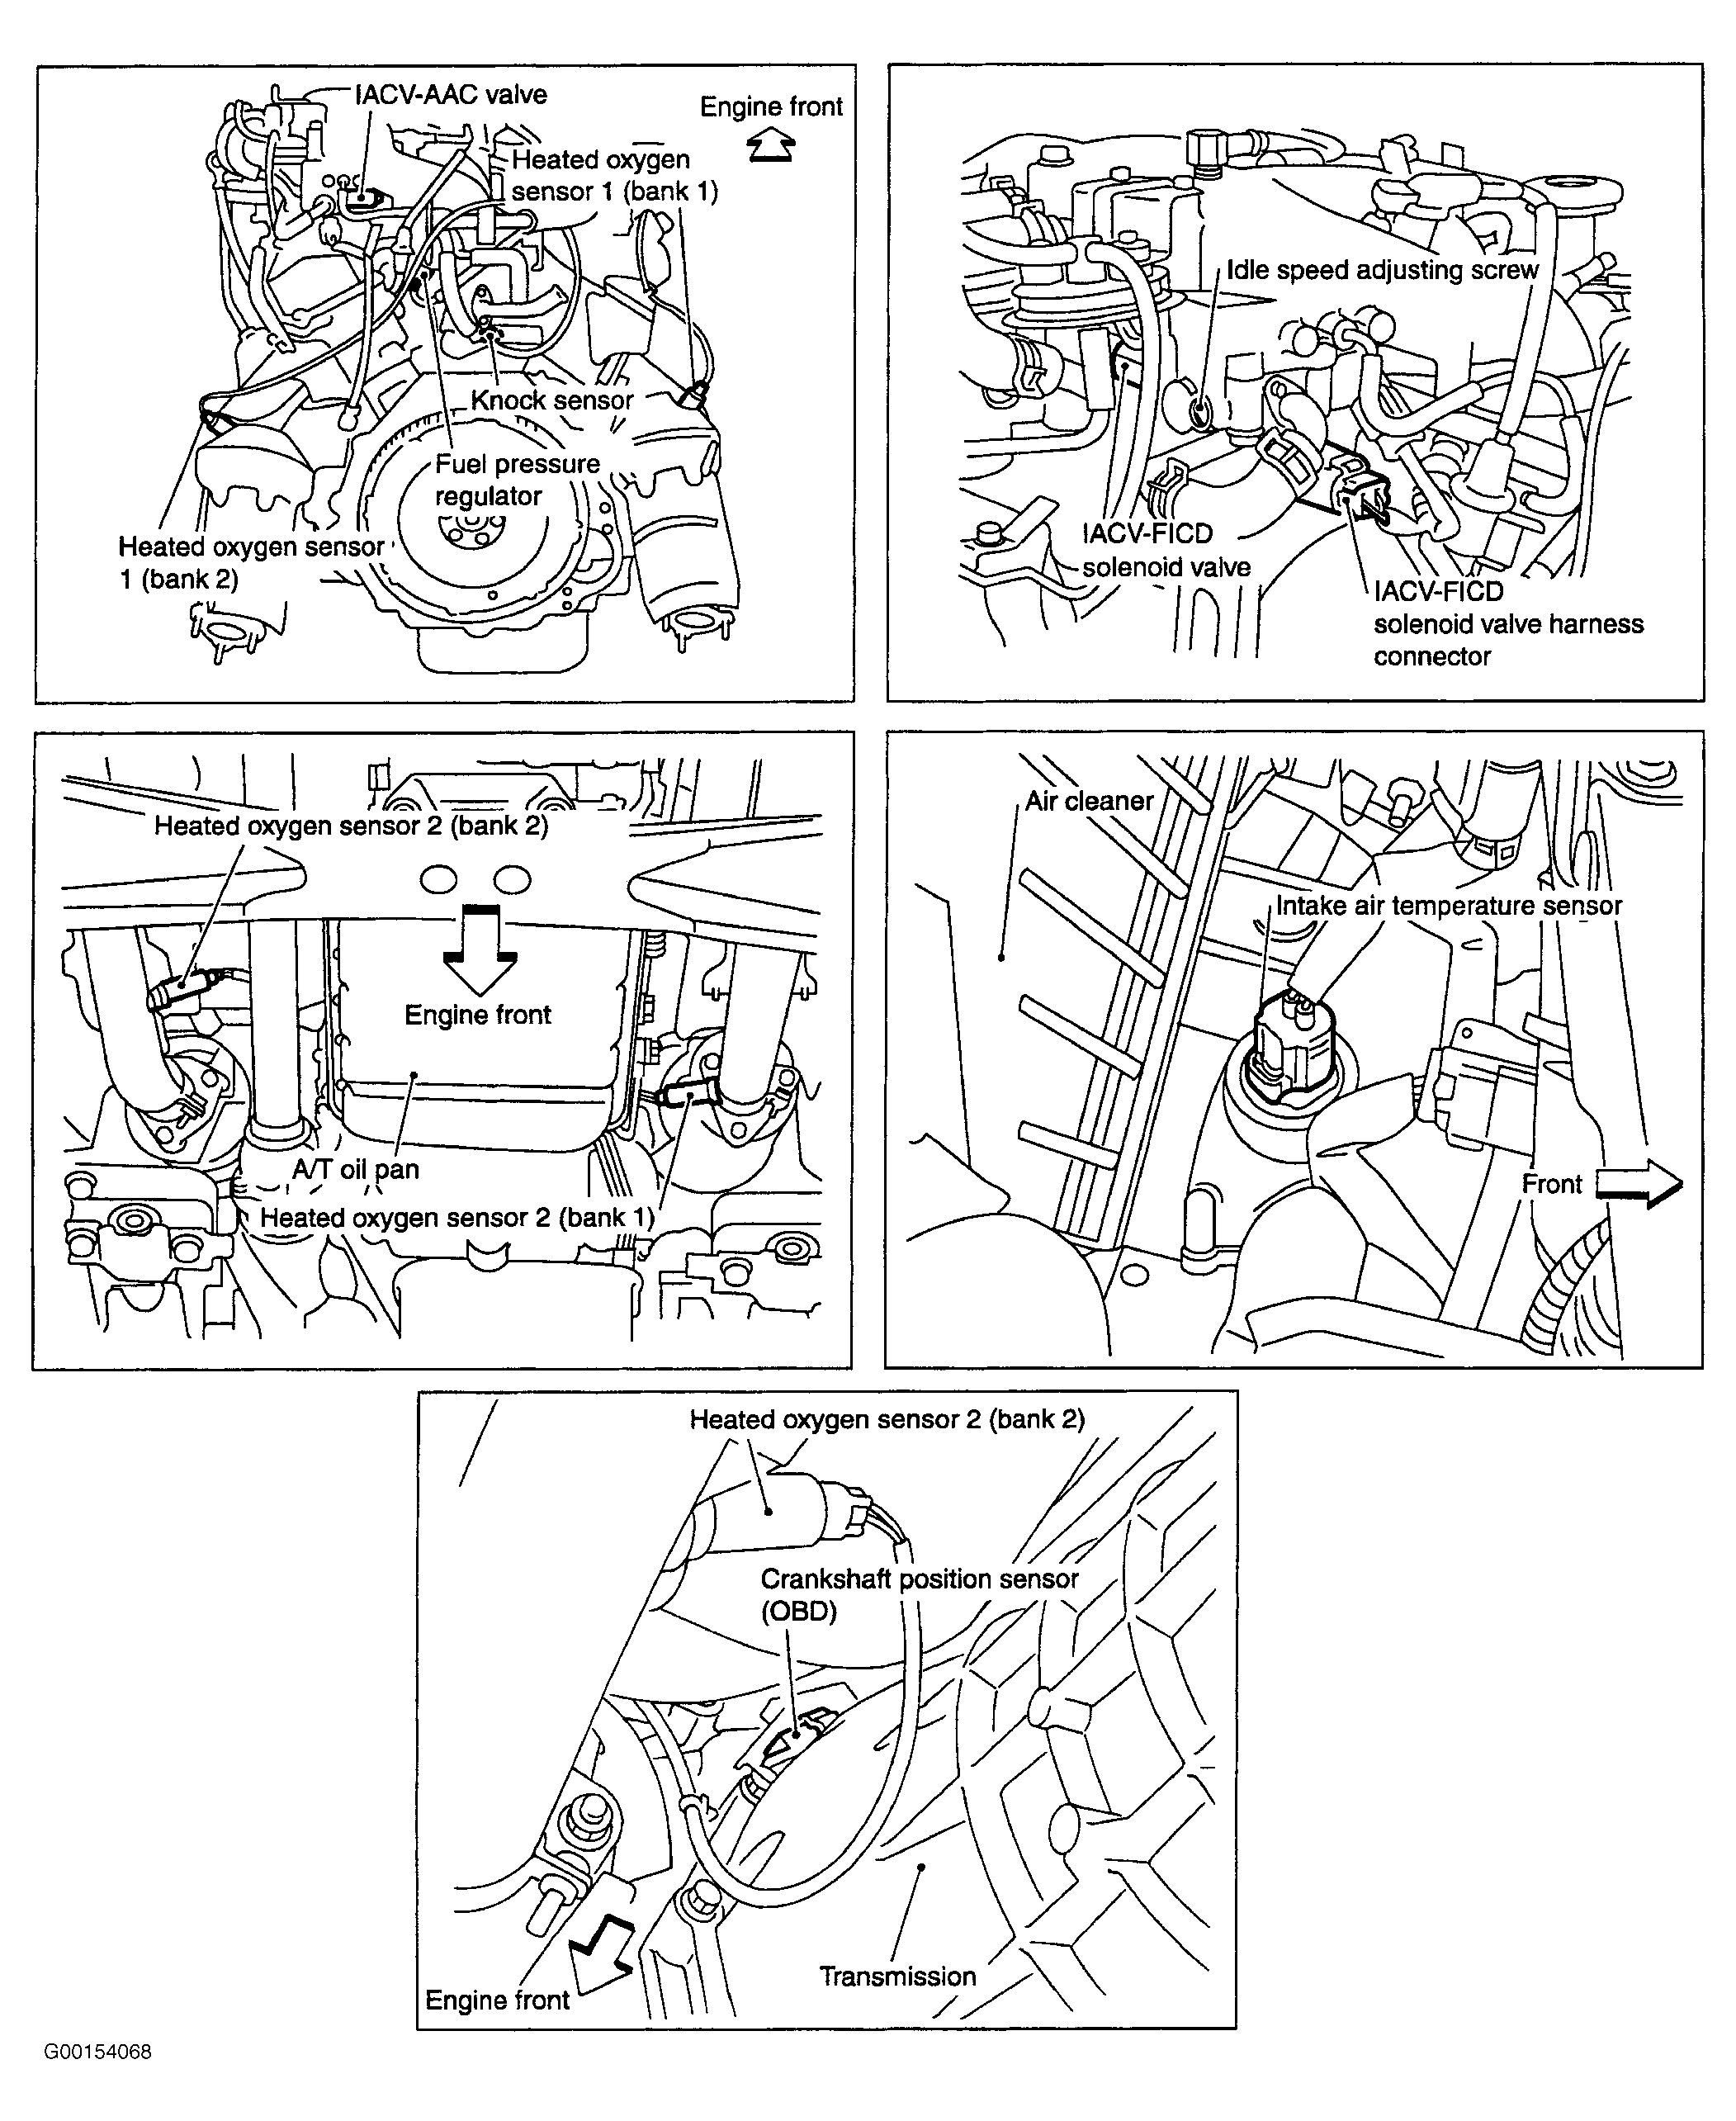 Pcv Valve Location 2004 Chevy Trailblazer likewise 3siu9 2002 Olds Bravada Engine Codes Po172 Po340 additionally Watch further Chevy Trailblazer Oil Pressure Switch Location further Chevy Aveo Camshaft Position Sensor Location. on 2005 chevy aveo engine diagram knock sensor